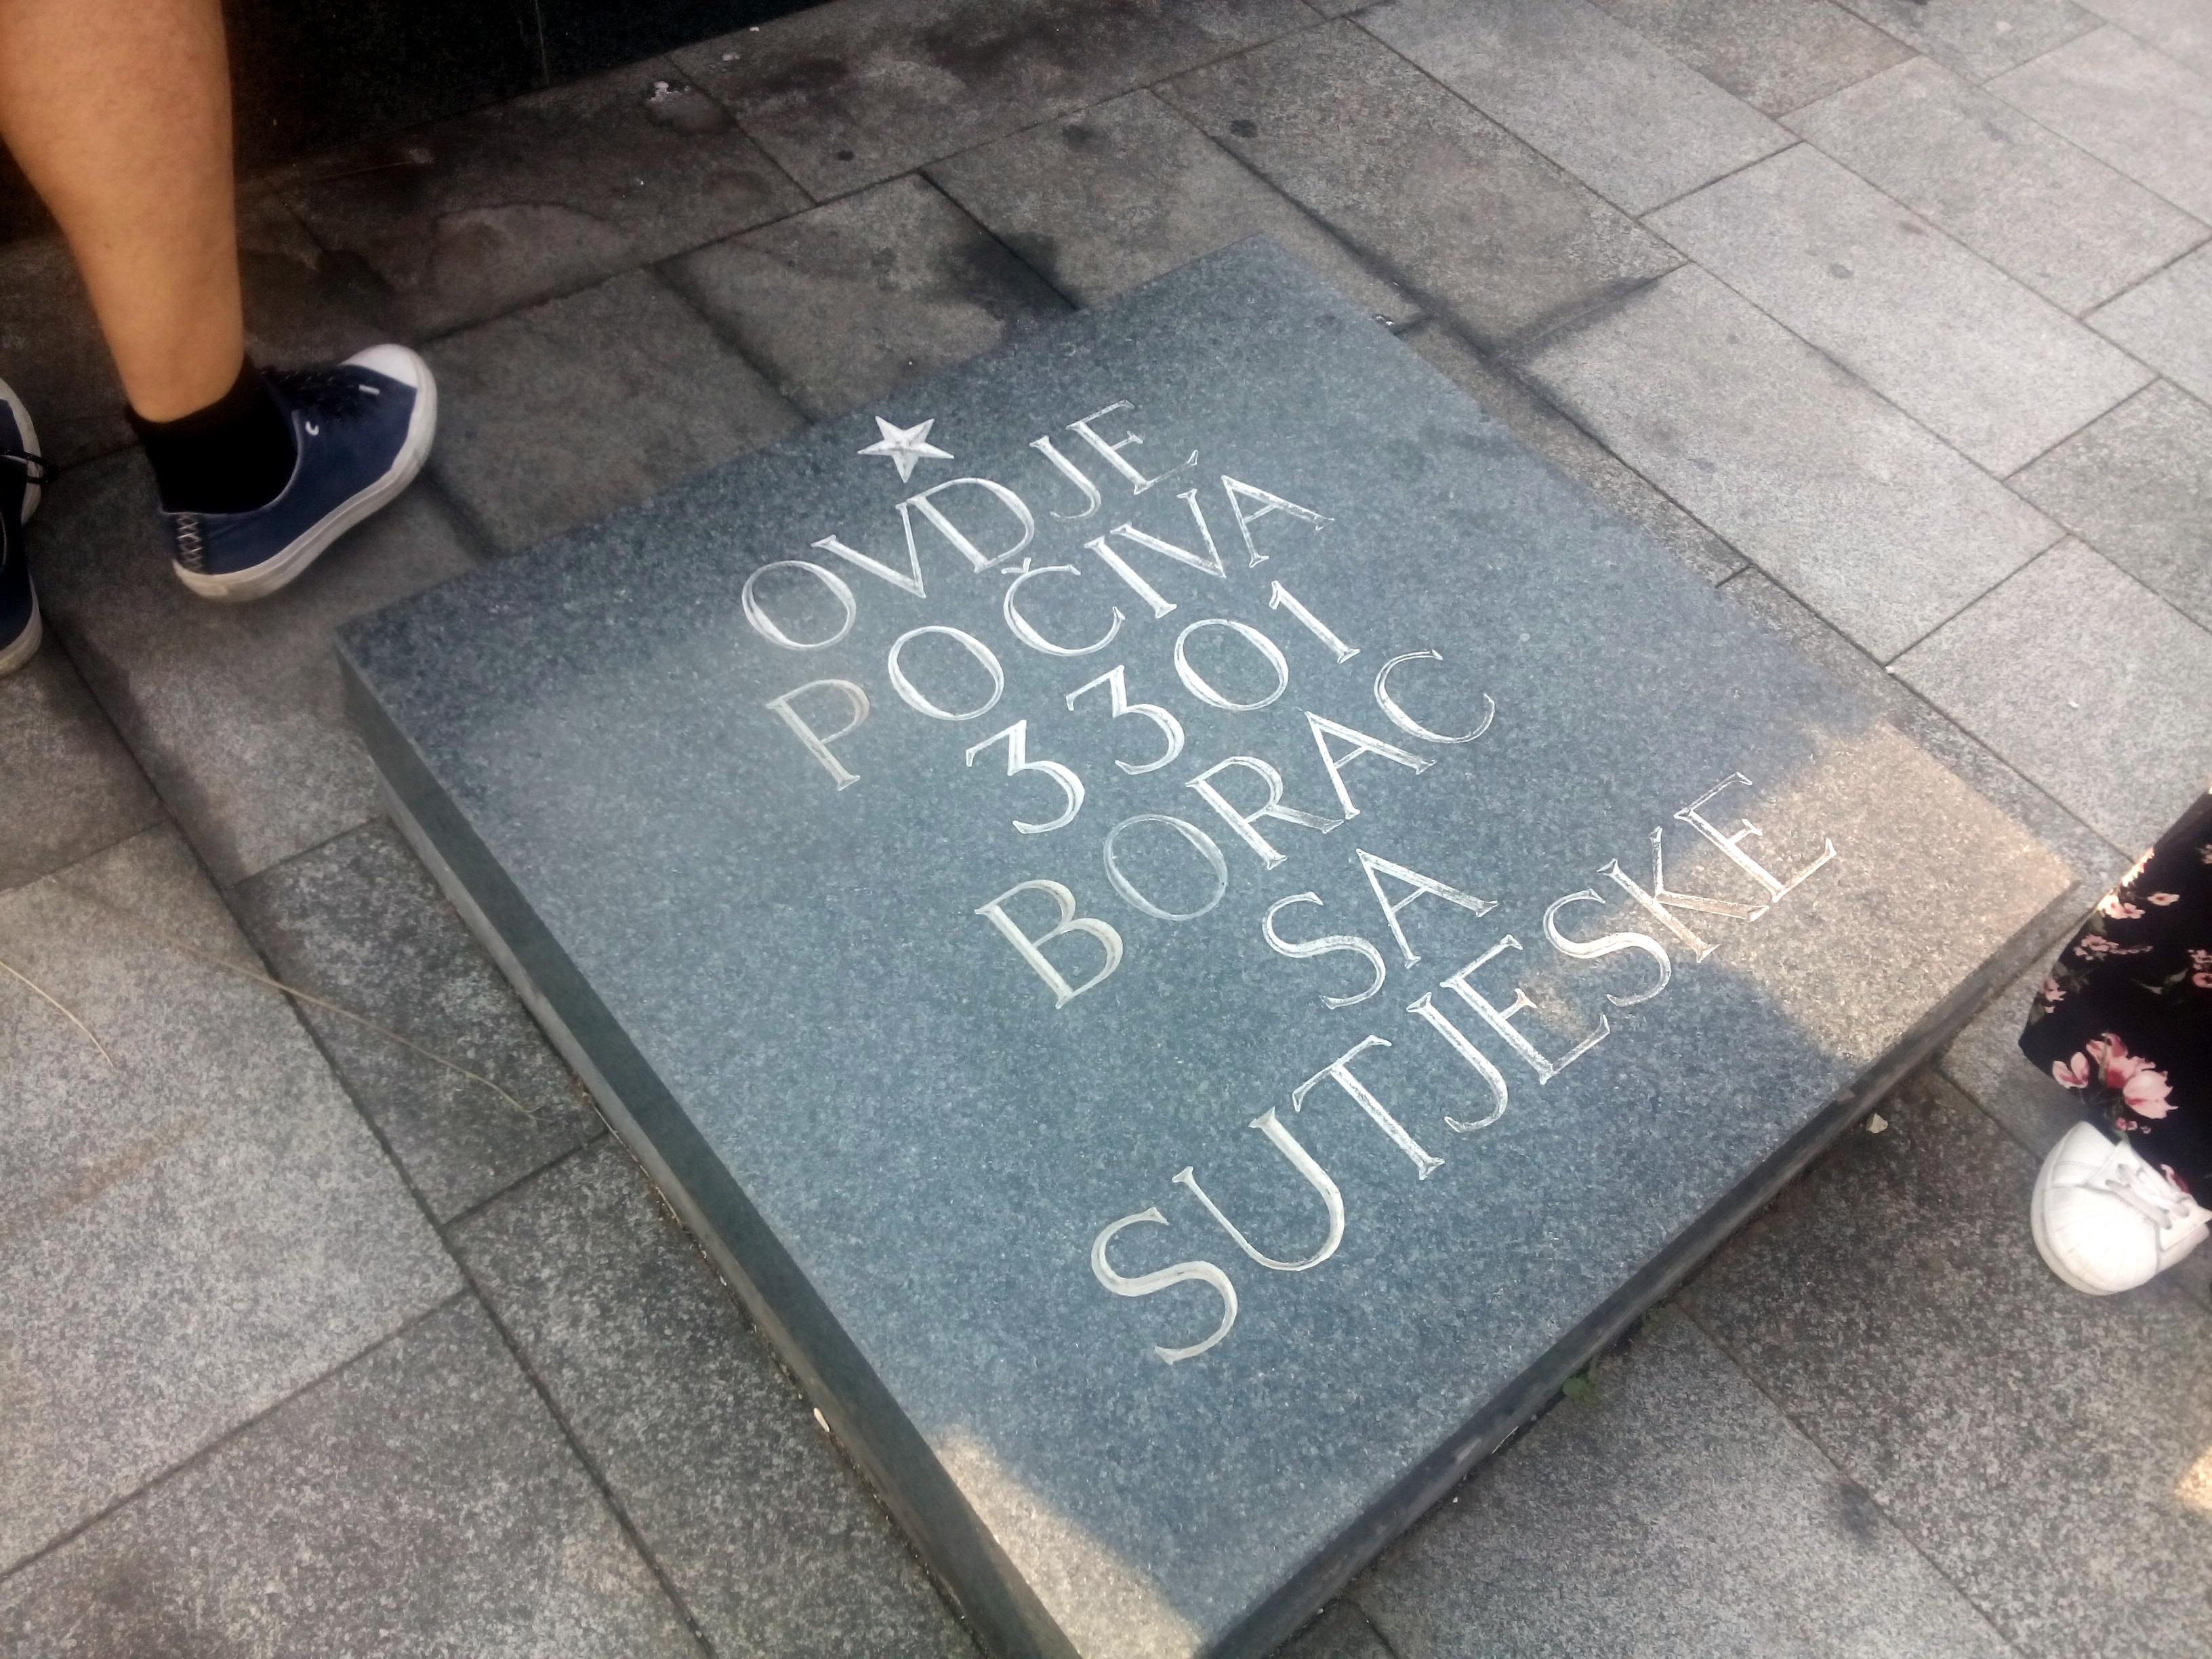 https://i.amy.gy/2017-sarajevo/IMG_20170819_161429.jpg